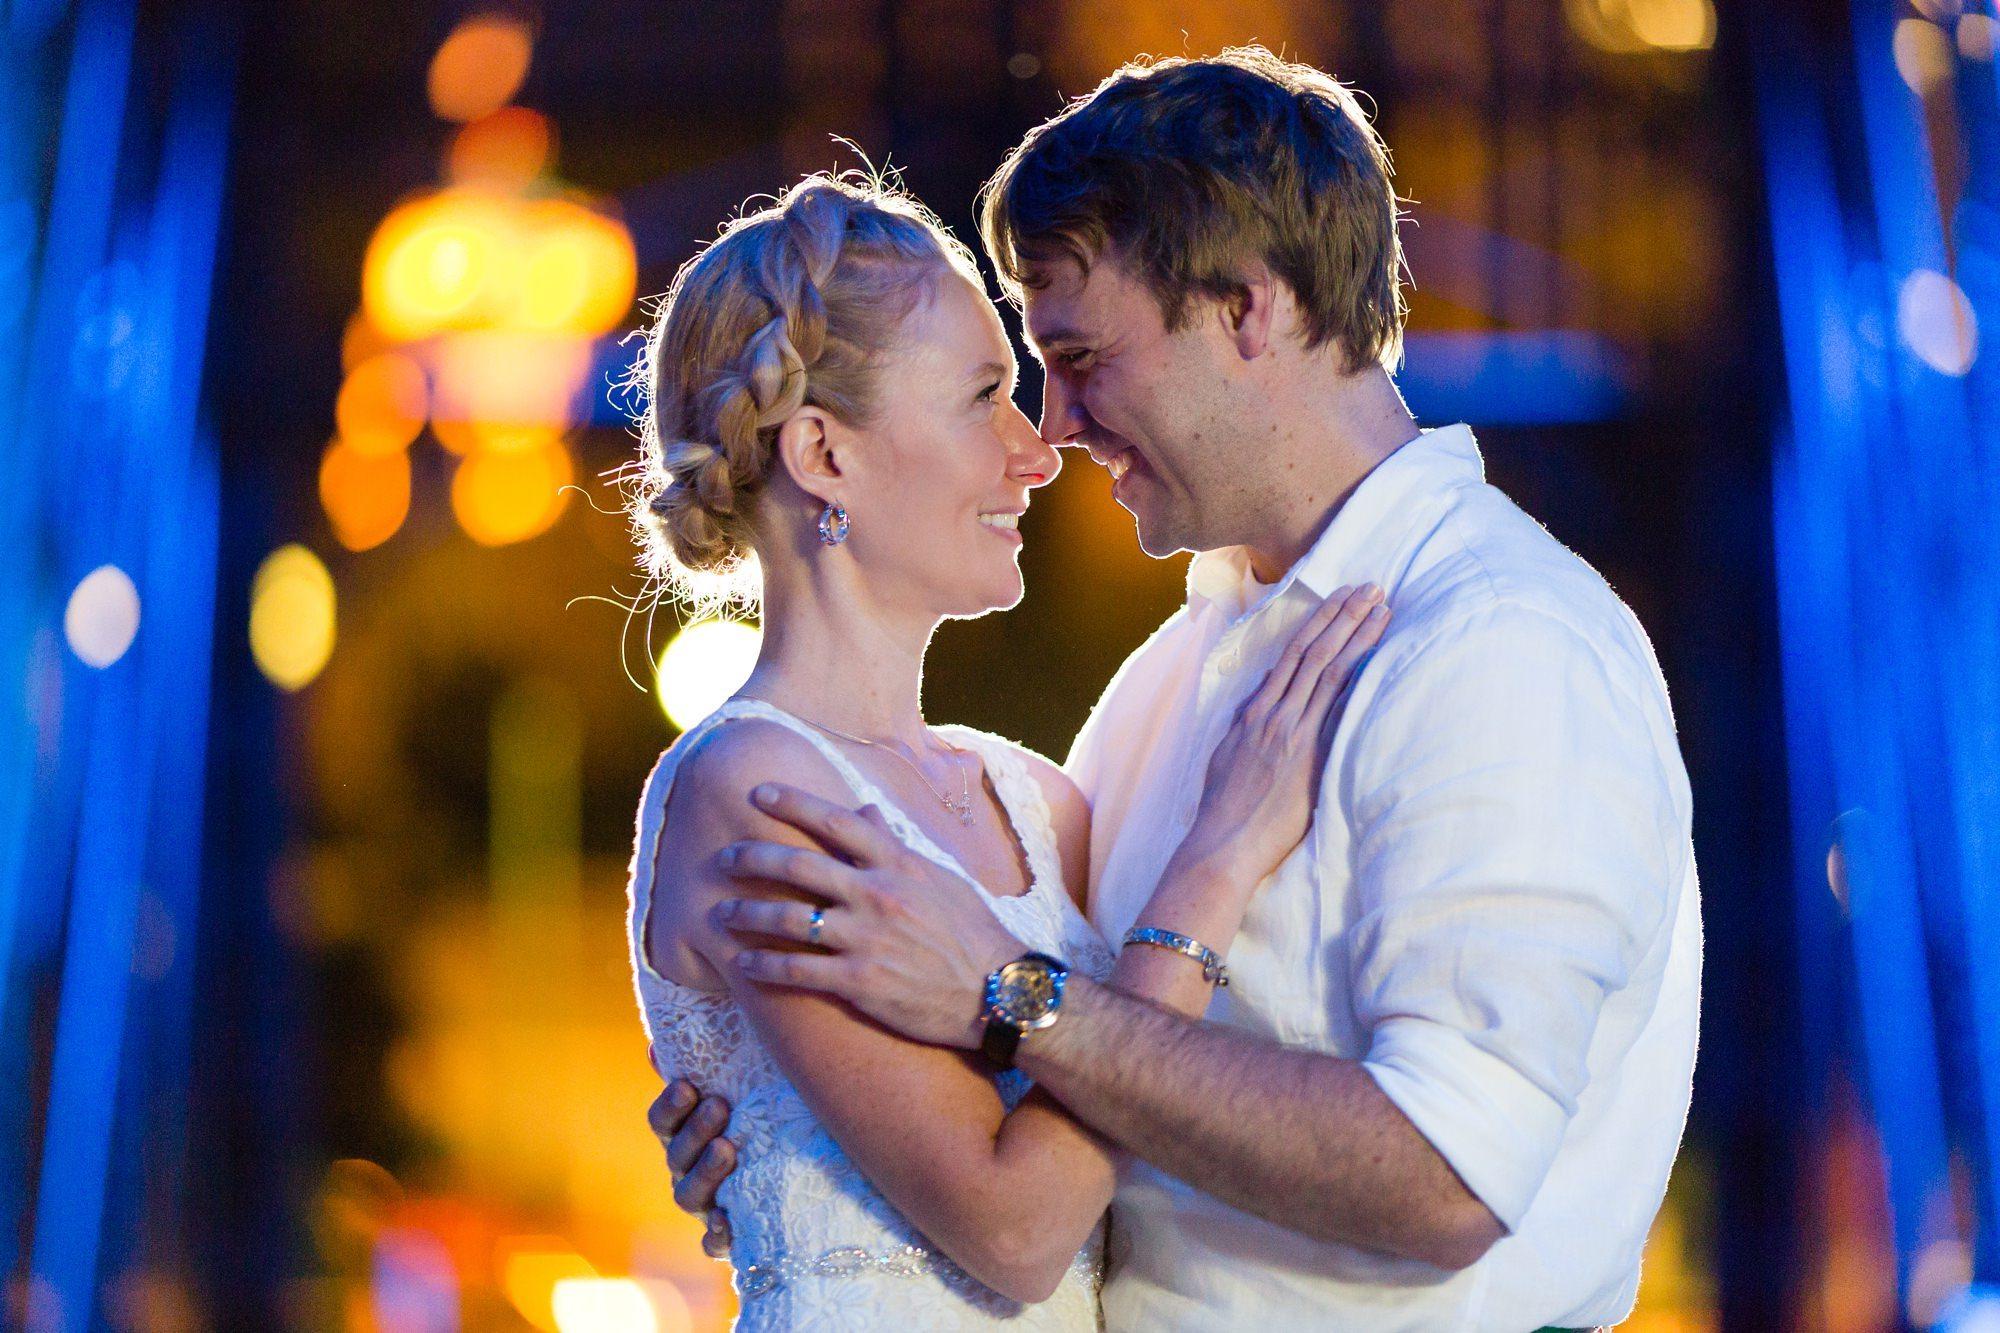 Night time couples portraits at Ft. Wayne Indiana Wedding